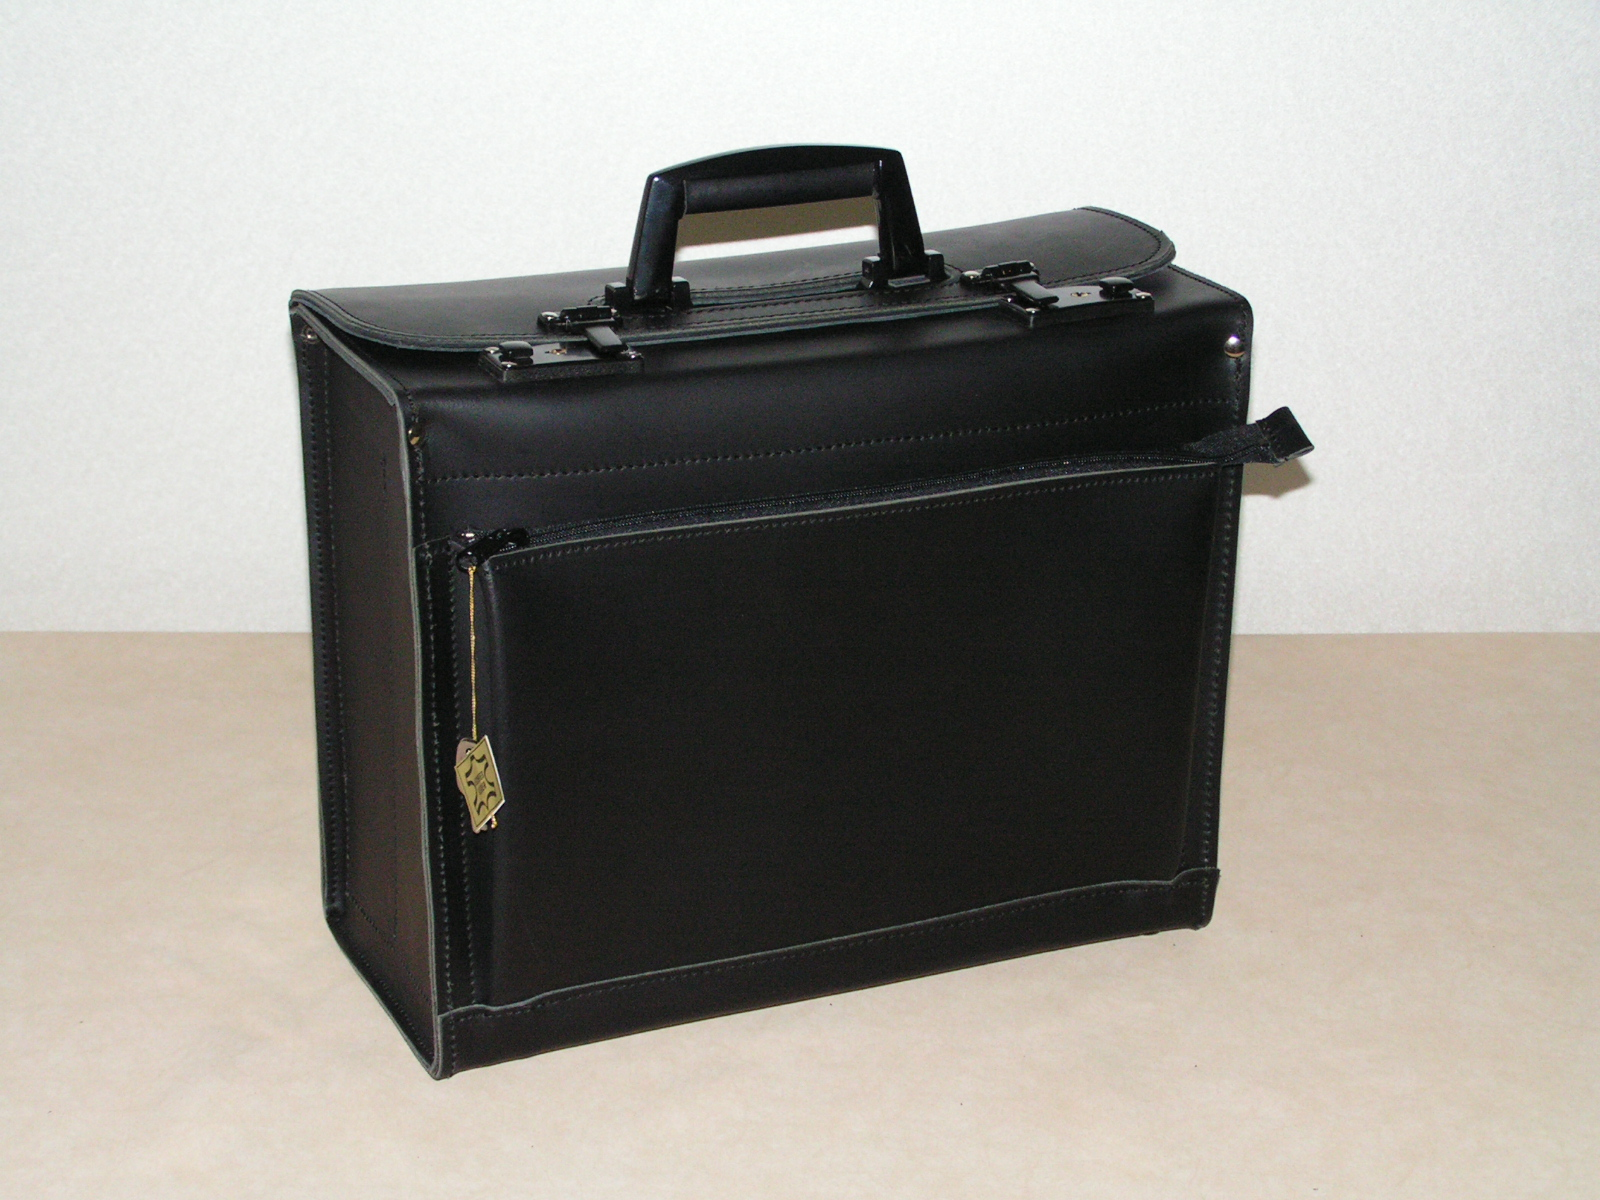 Fahrertasche/Pilotenkoffer Nr. 801 Rindleder schwarz